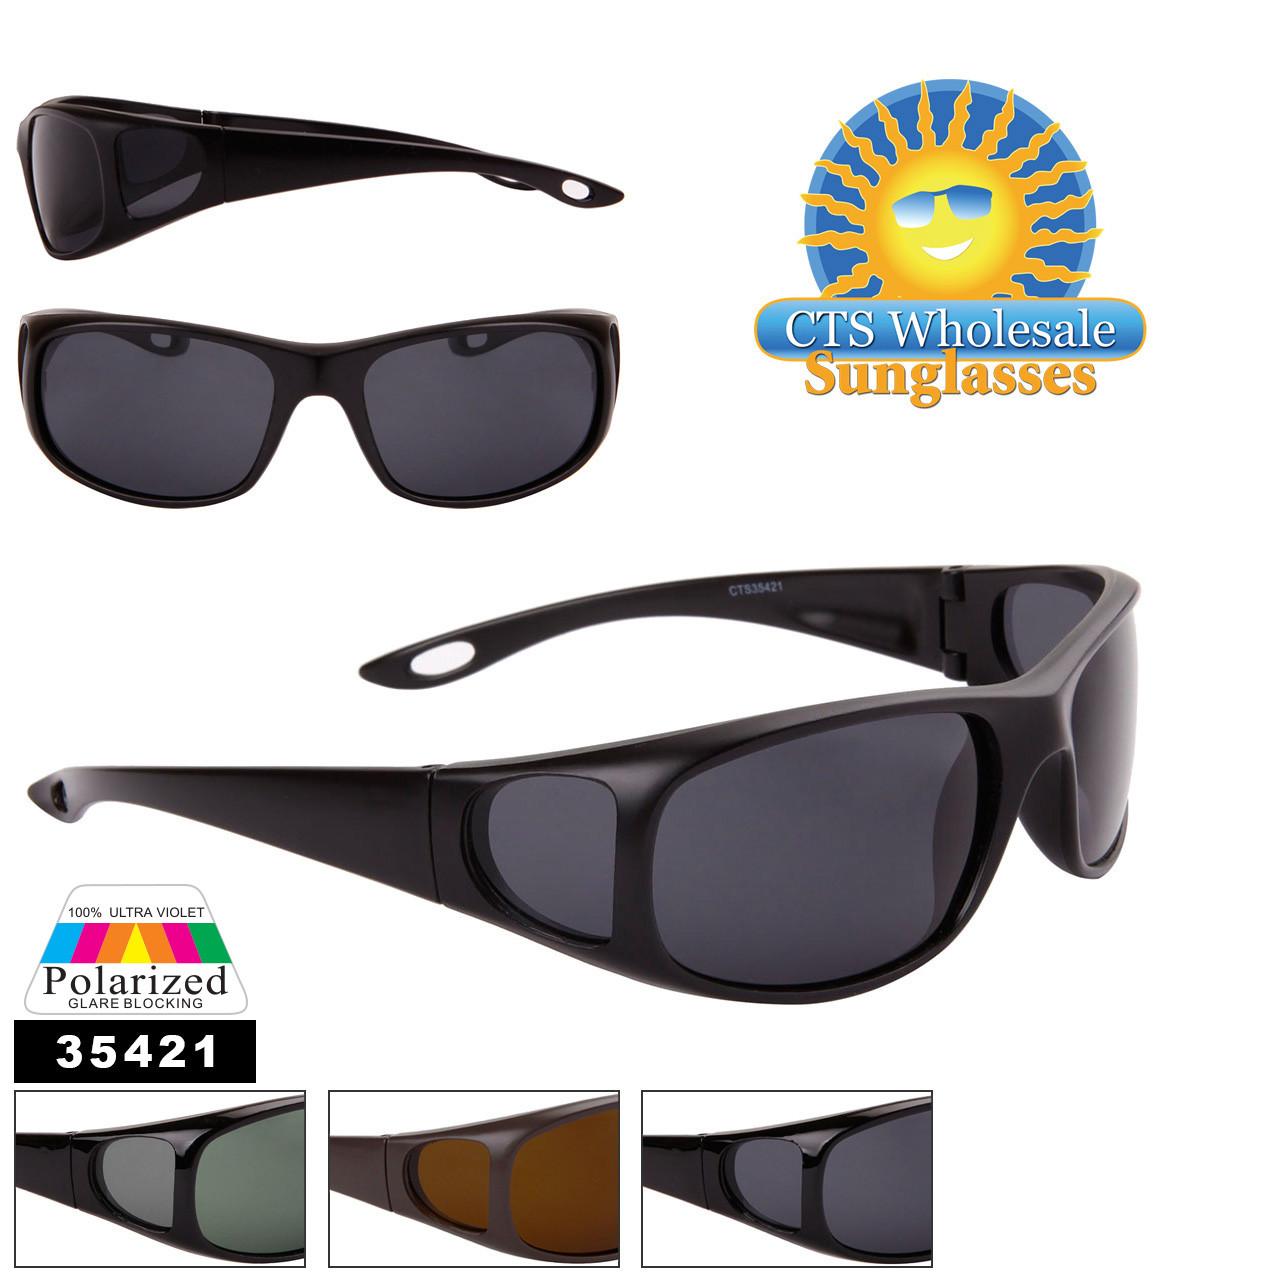 Polarized Sunglasses - Style #35421 (Assorted Colors) (12 pcs.)